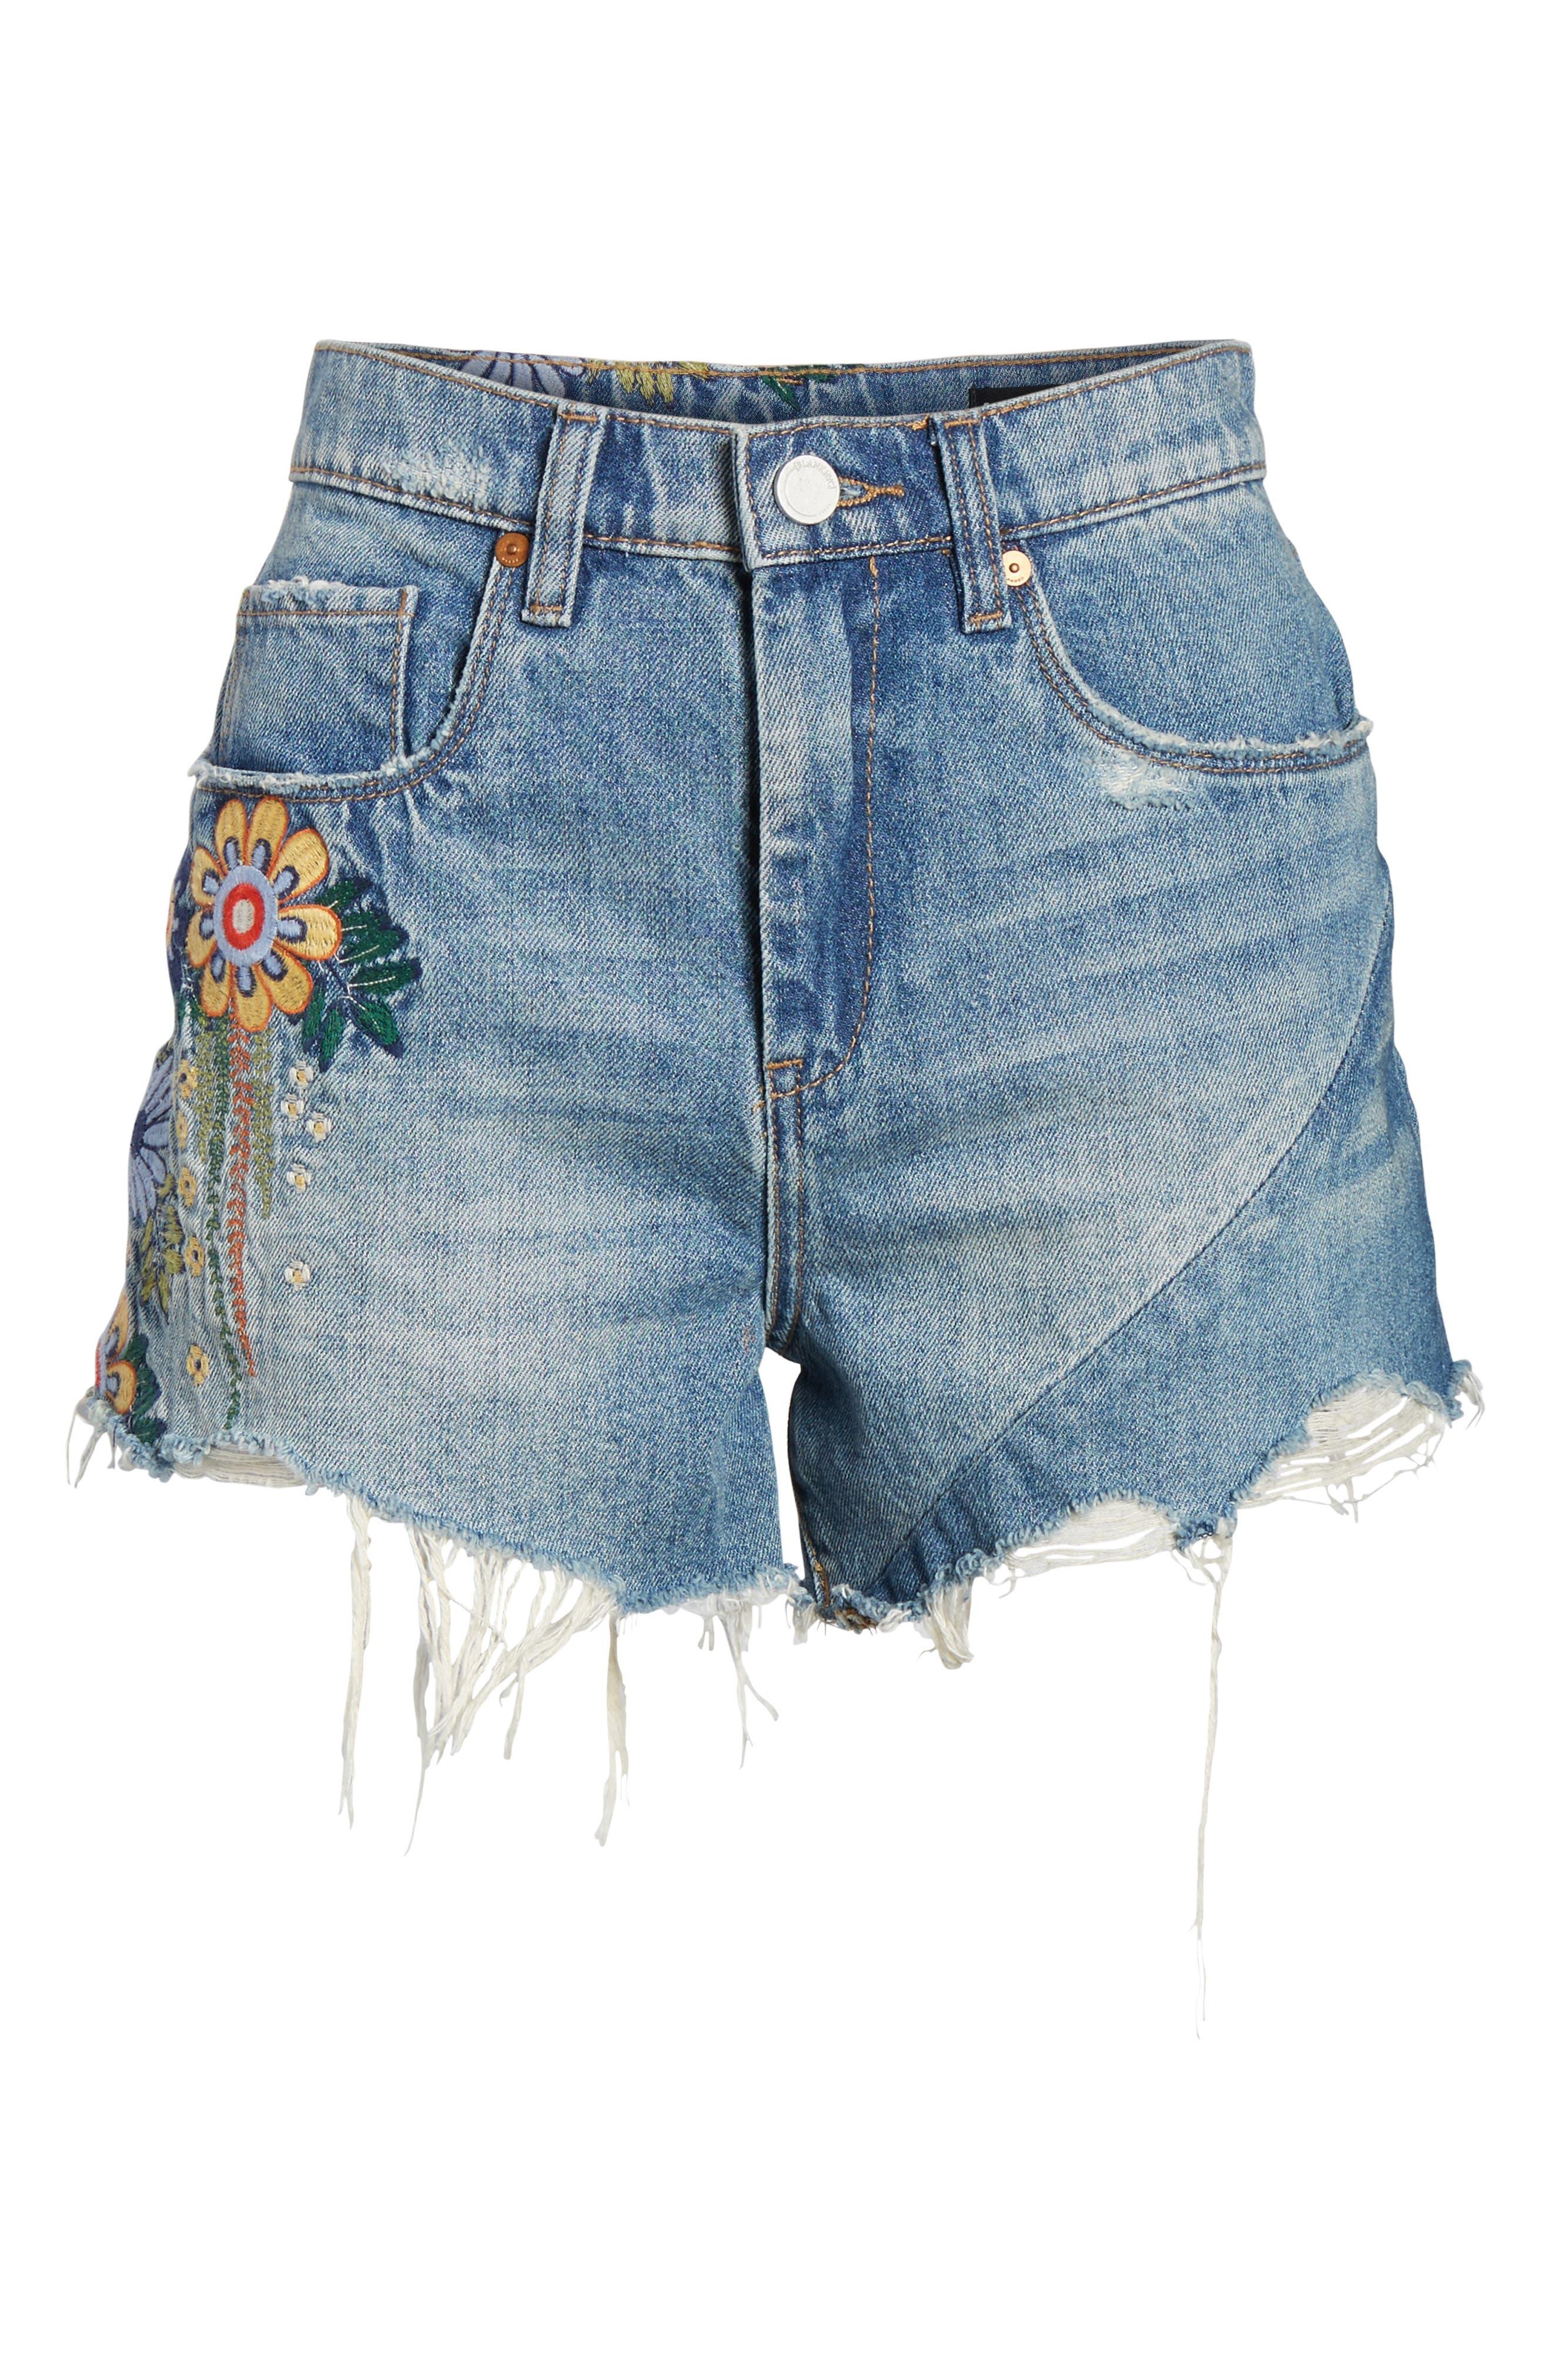 Sonic Bloom Embroidered Denim Shorts,                             Alternate thumbnail 6, color,                             Blue